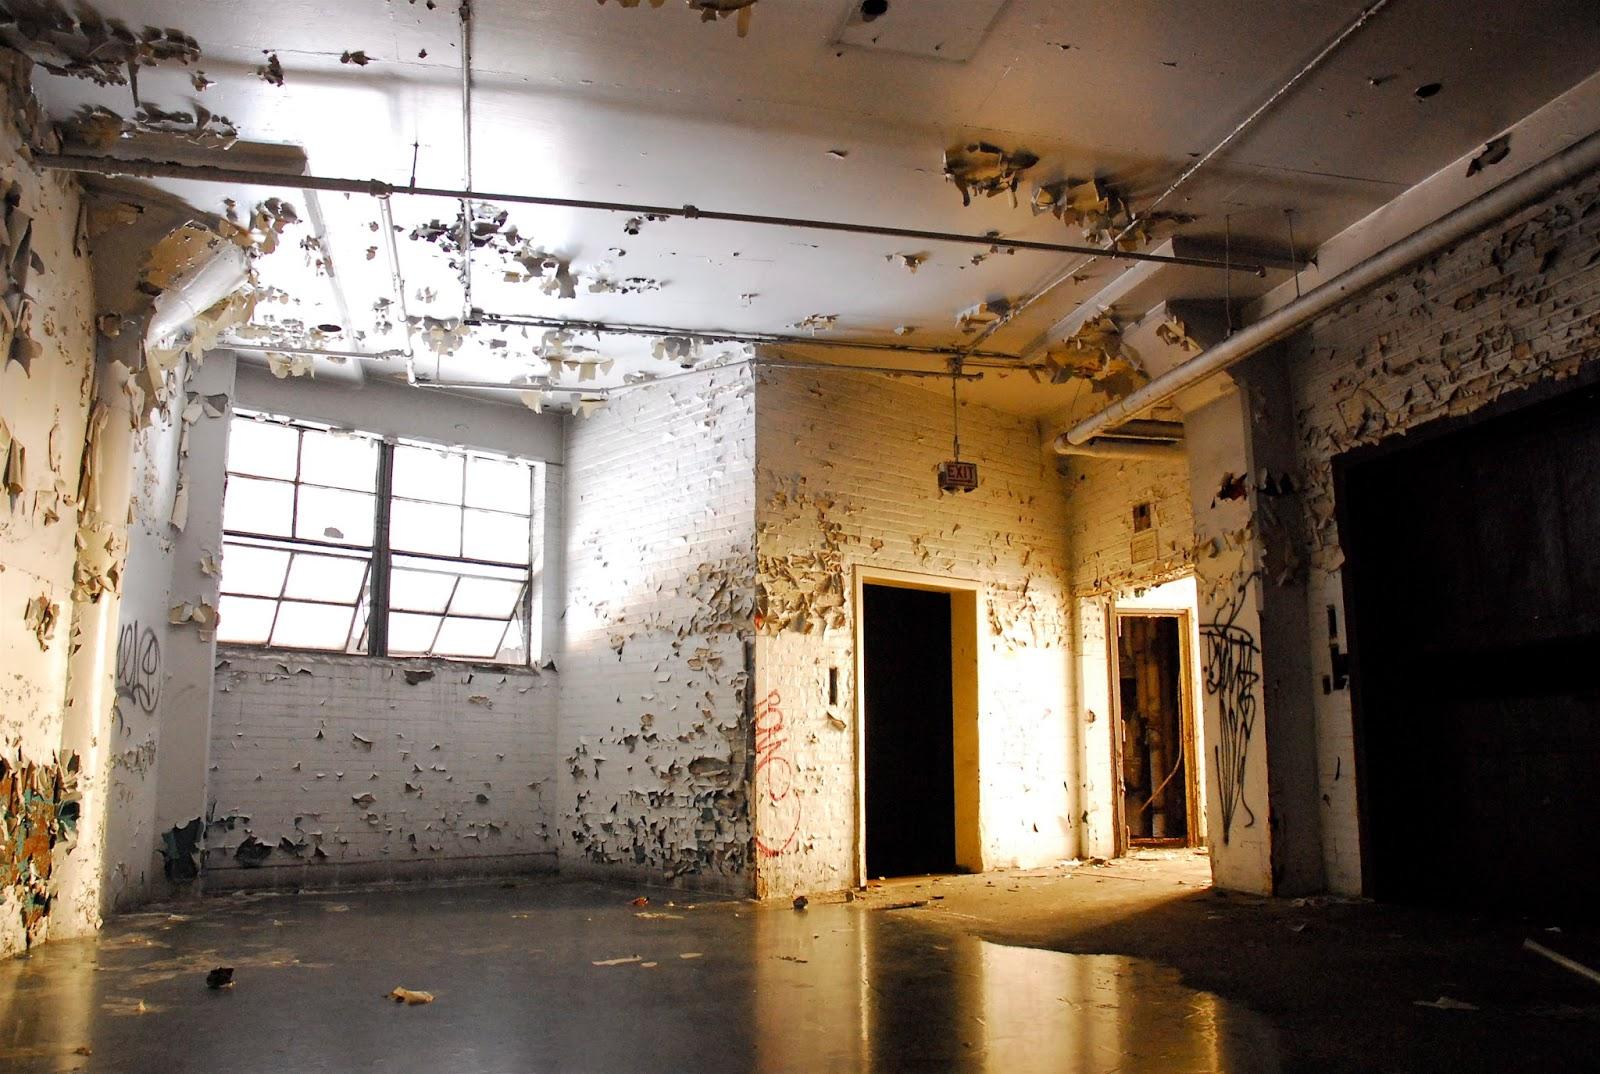 MATT TUTEUR PHOTOGRAPHY CHICAGO'S ABANDONED REMNANTS ... | 1600 x 1074 jpeg 352kB